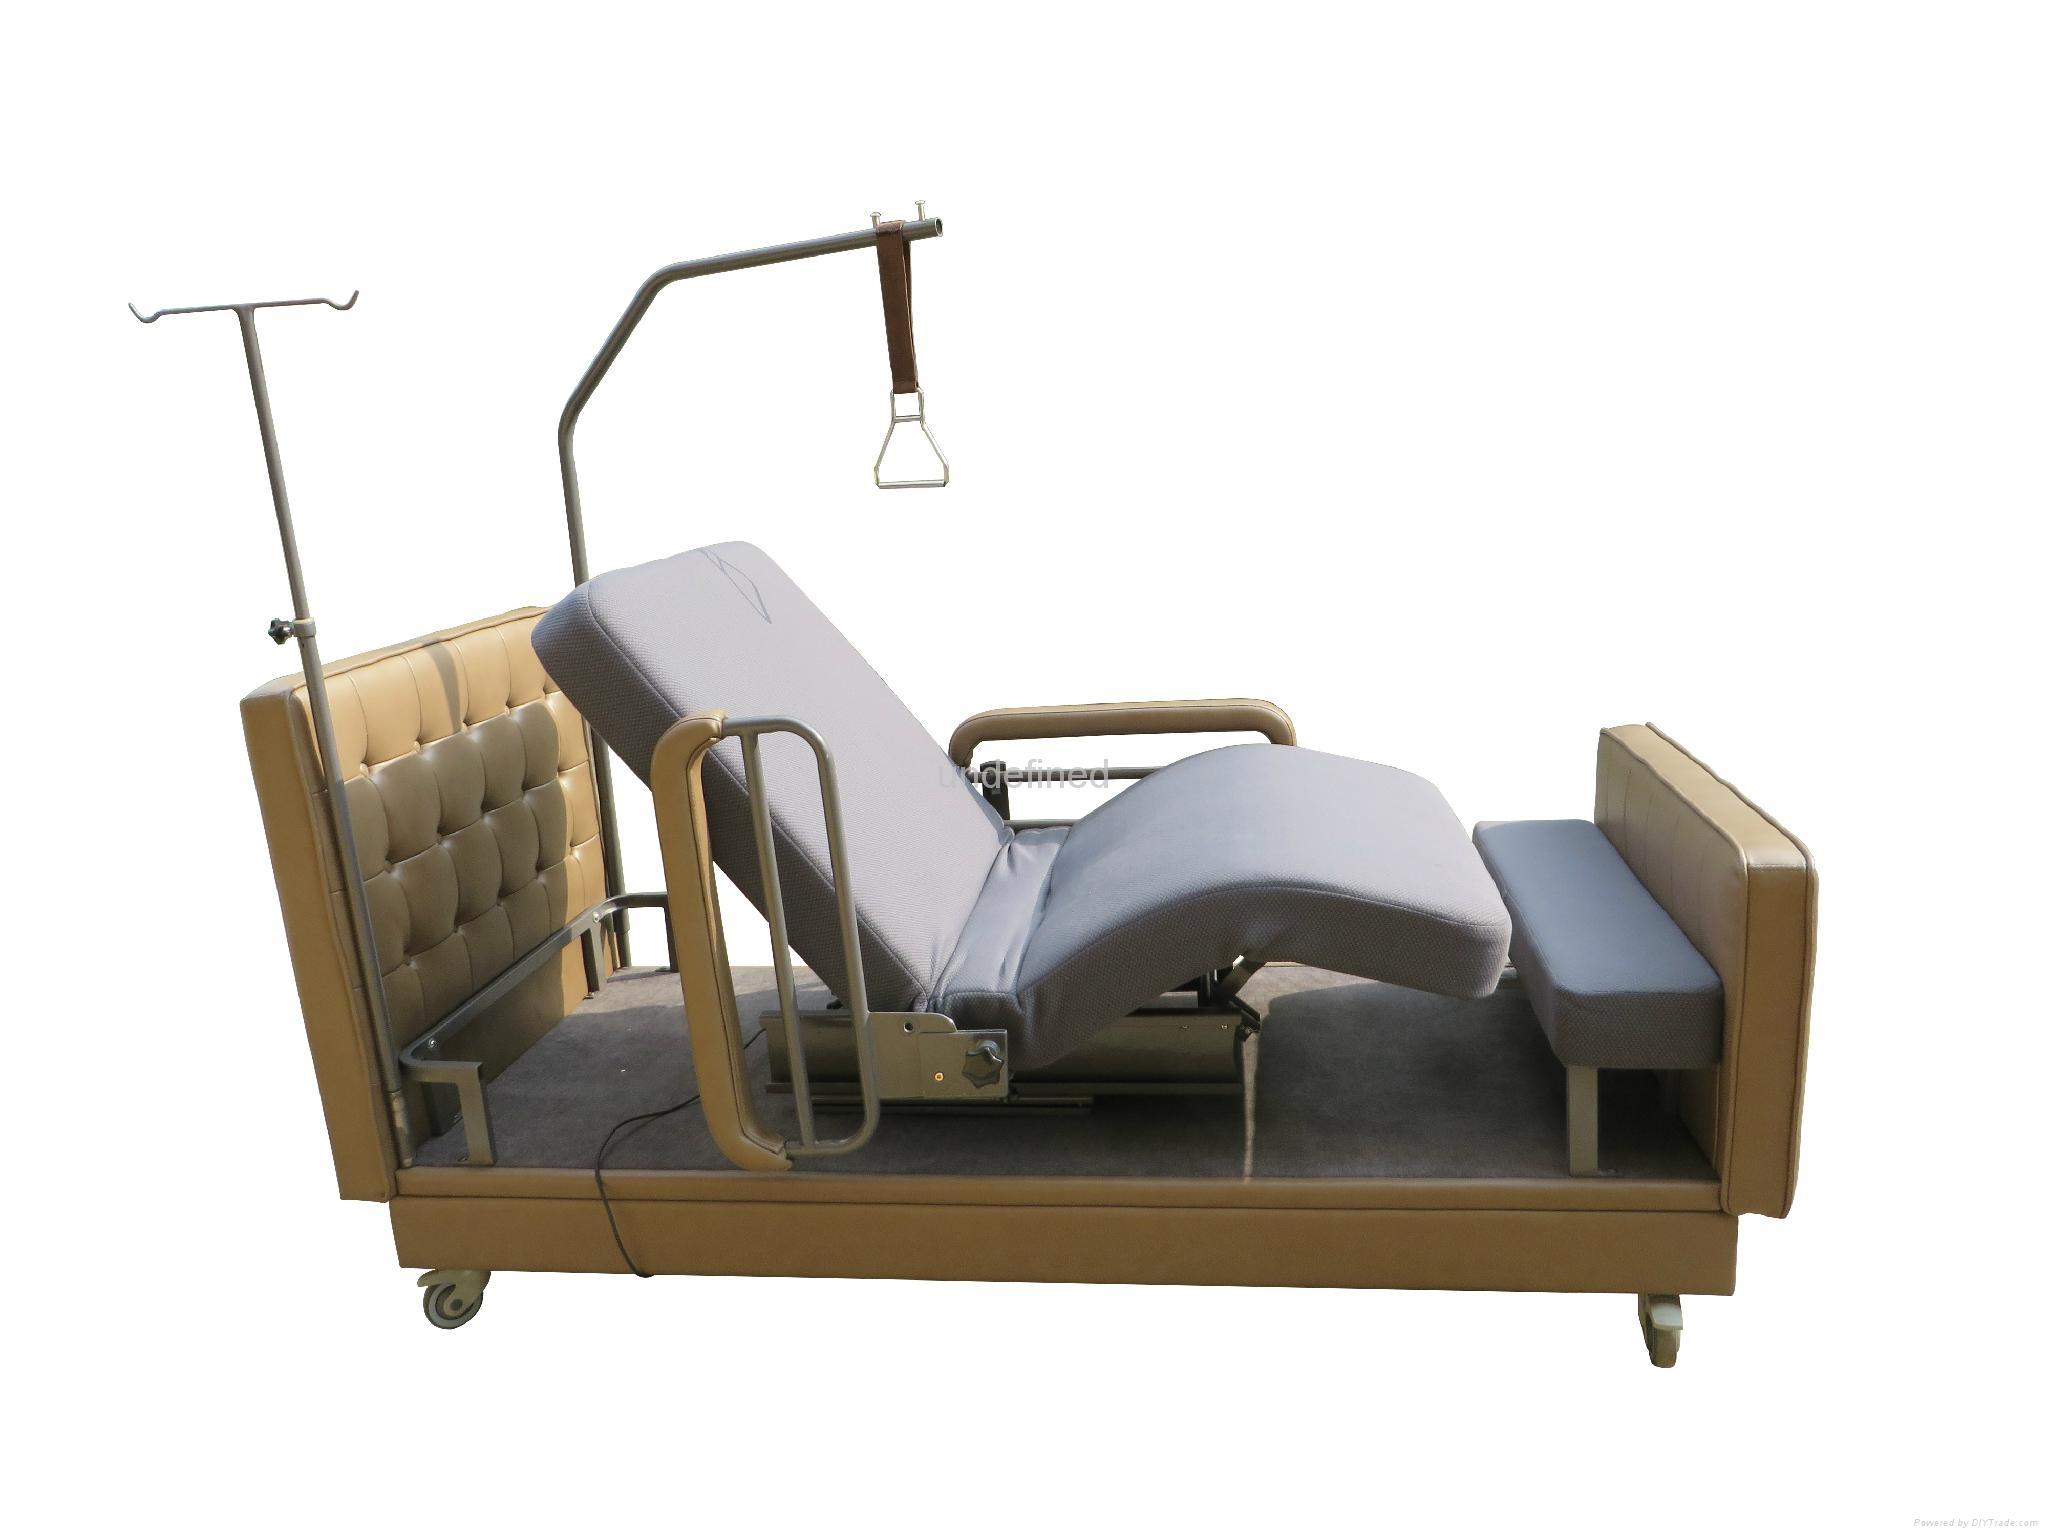 Home Use Hilo Rotation Latex Mattress Adjustable Bed Jj